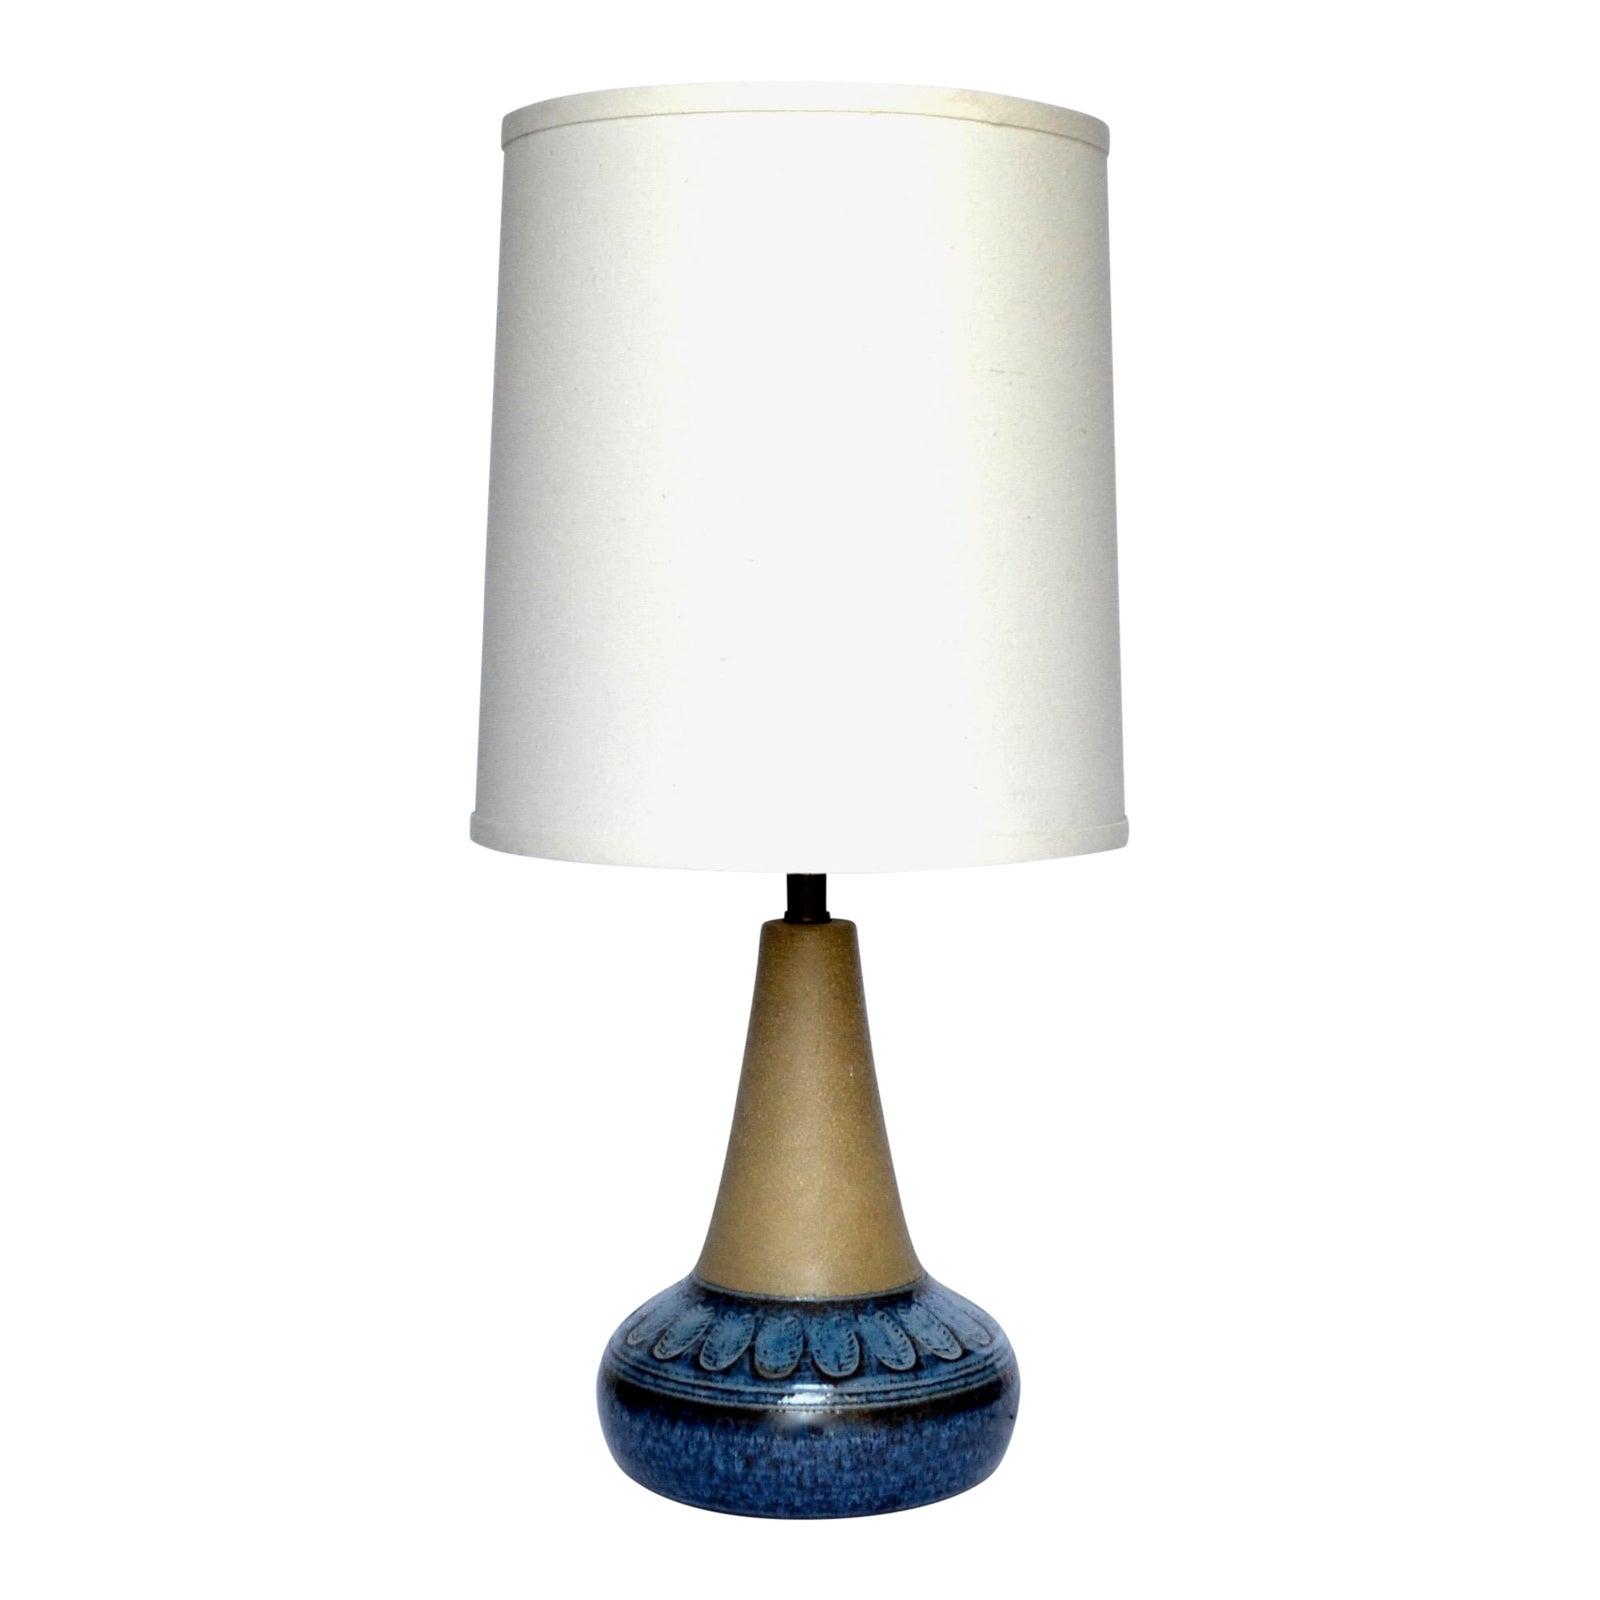 Soholm Stentoj Danish Modern Table Lamp 1960s Chairish